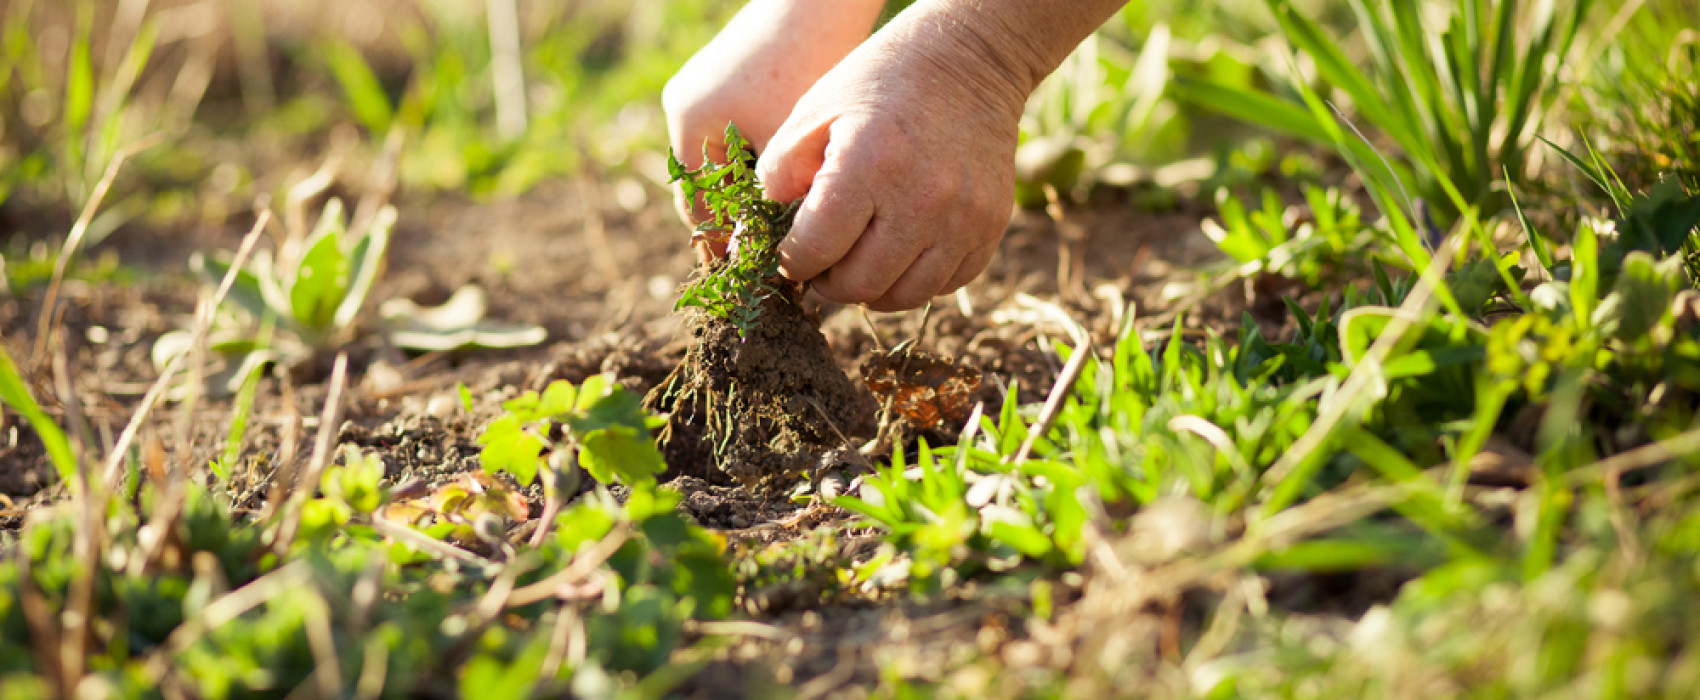 Tuintips: duurzaam onkruid beheersen